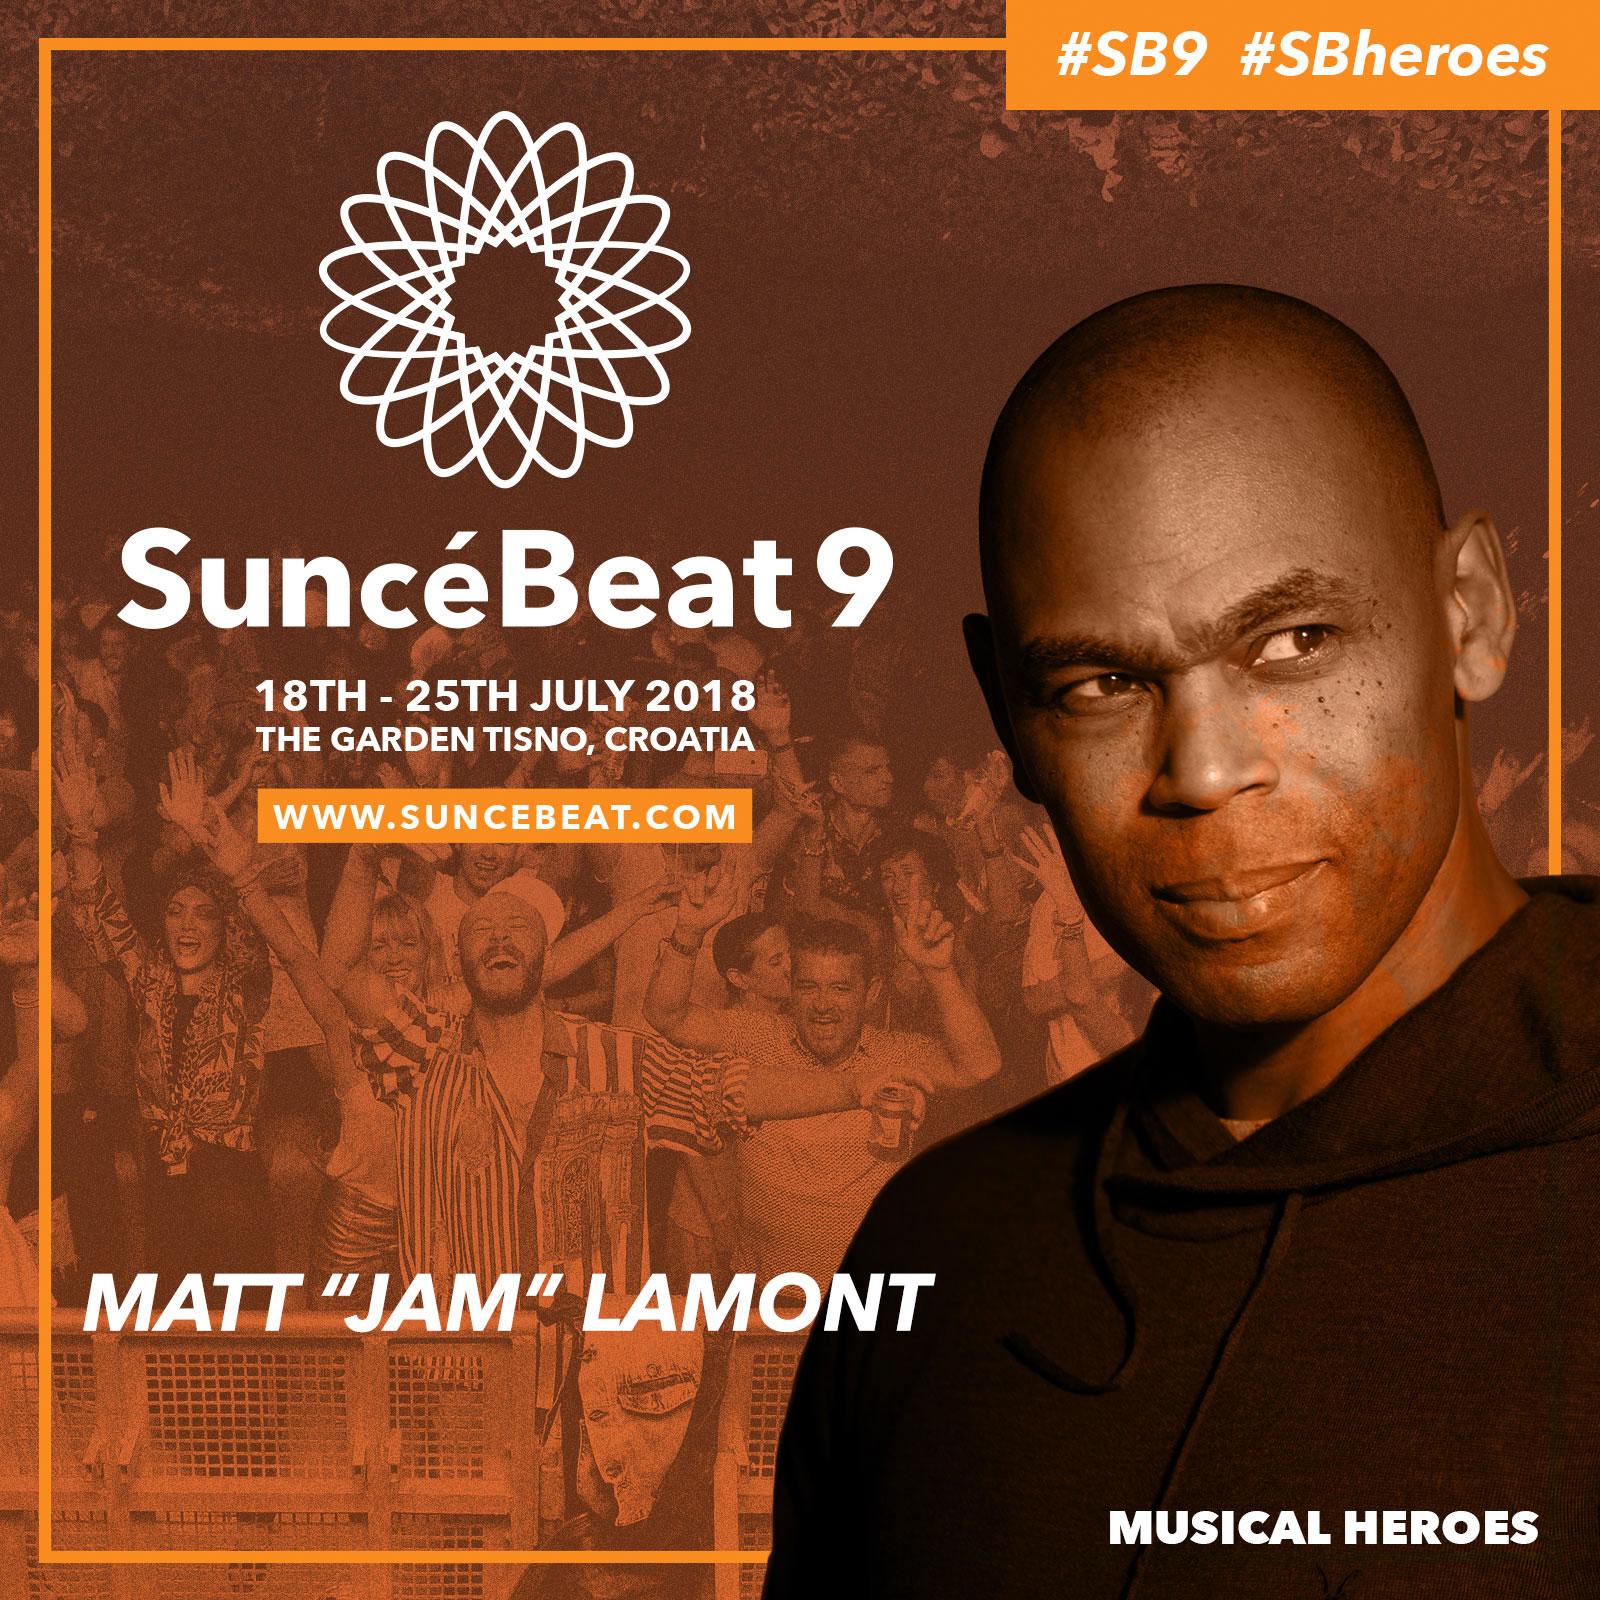 Matt Jam Lamont